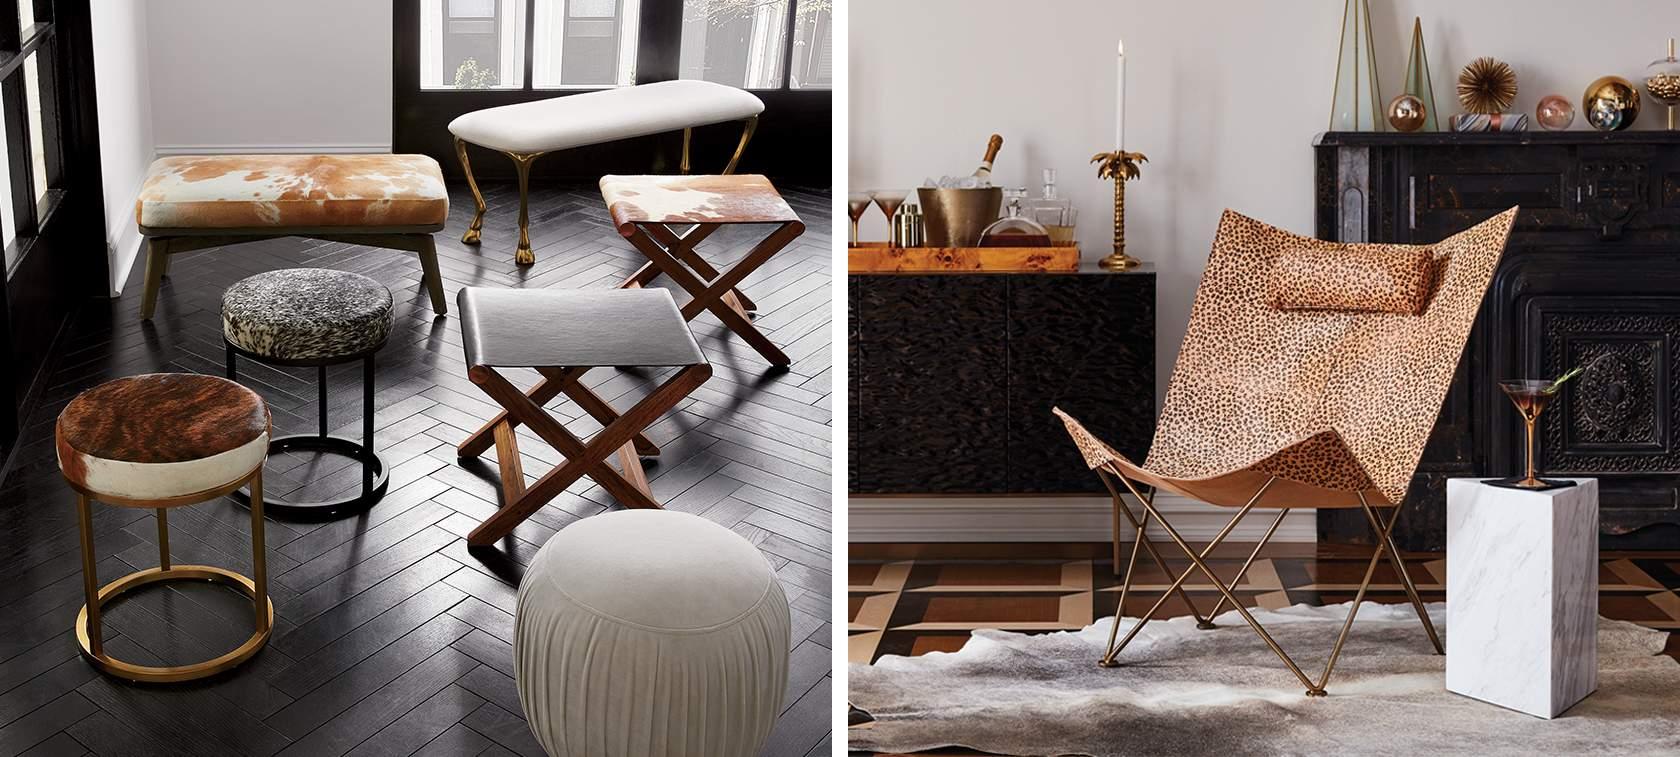 trending now. Modern and Unique Furniture Design   CB2